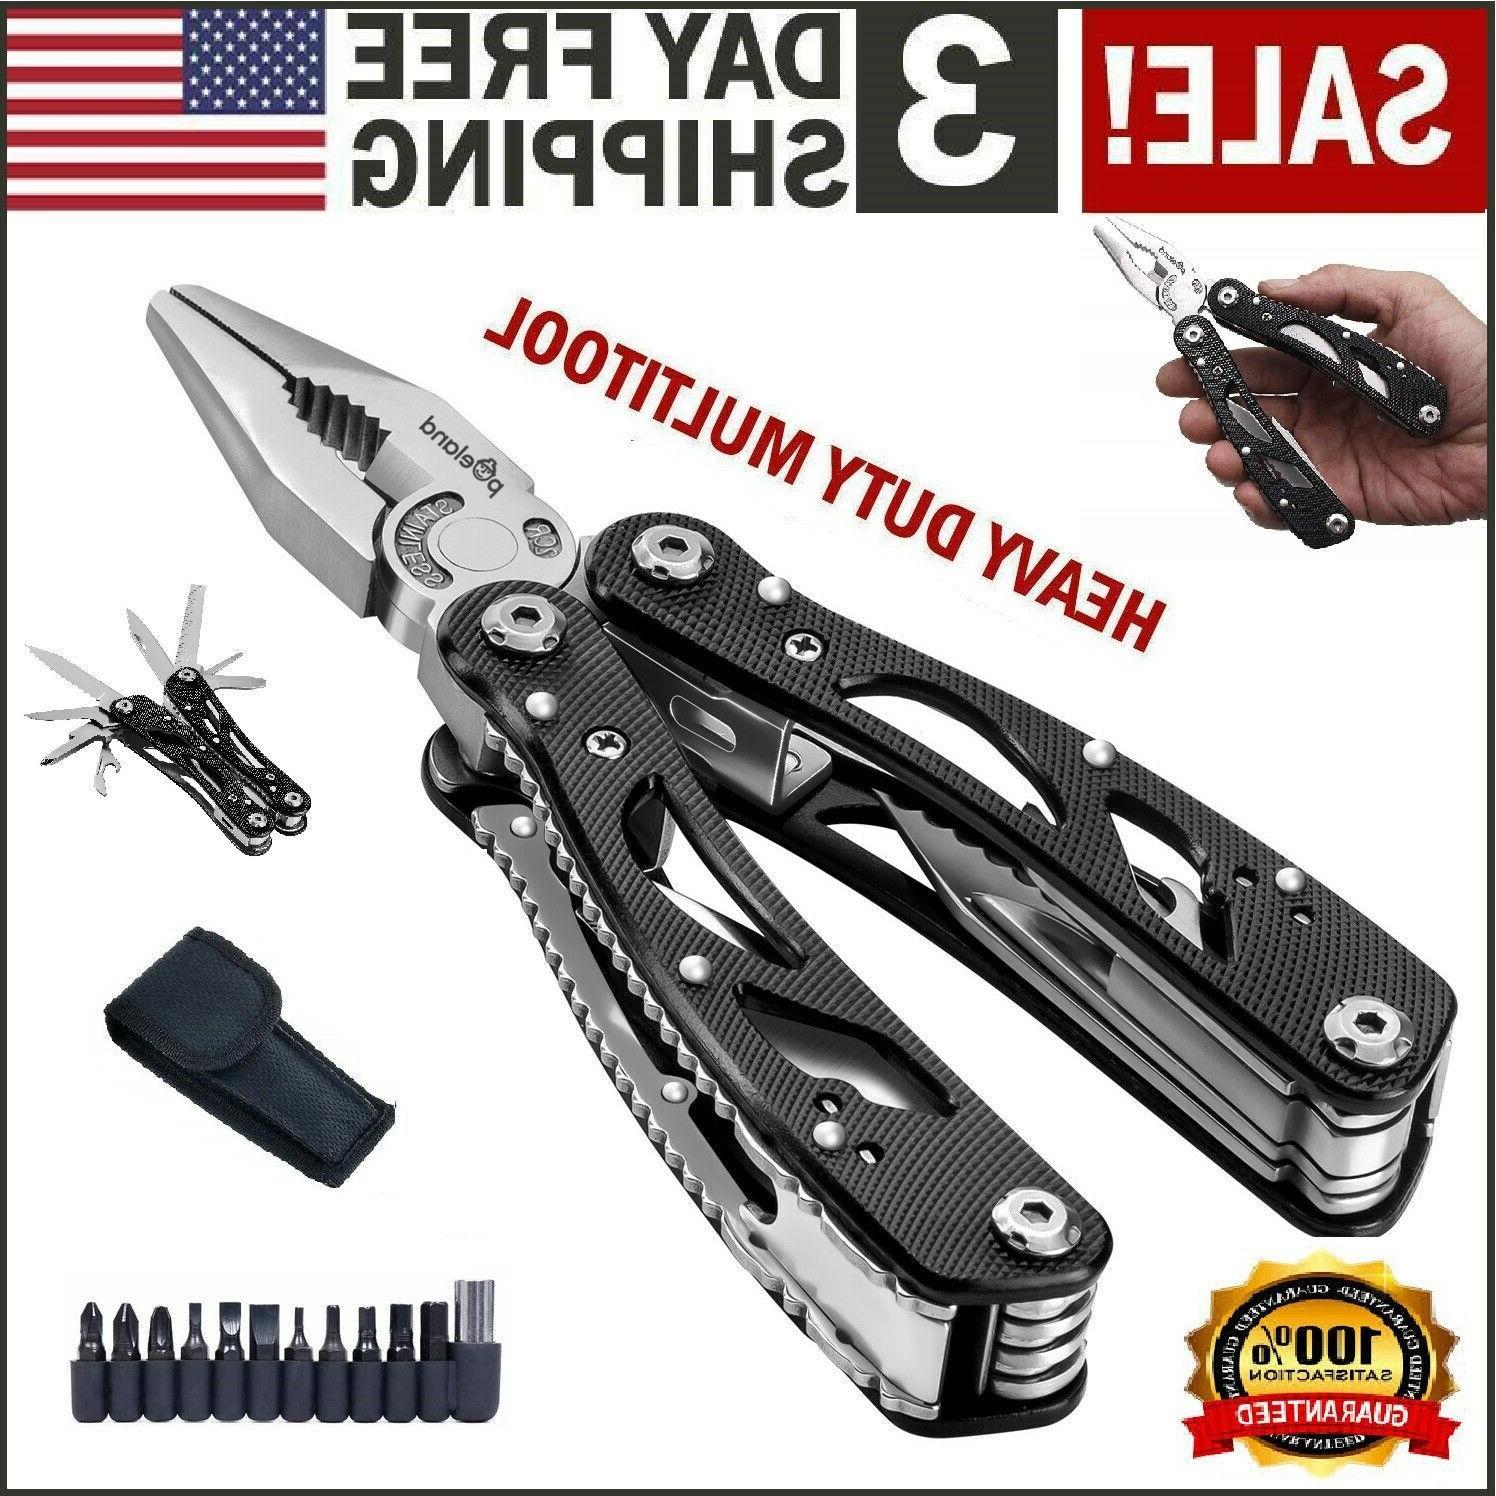 multi tool knife pliers saw kit folding